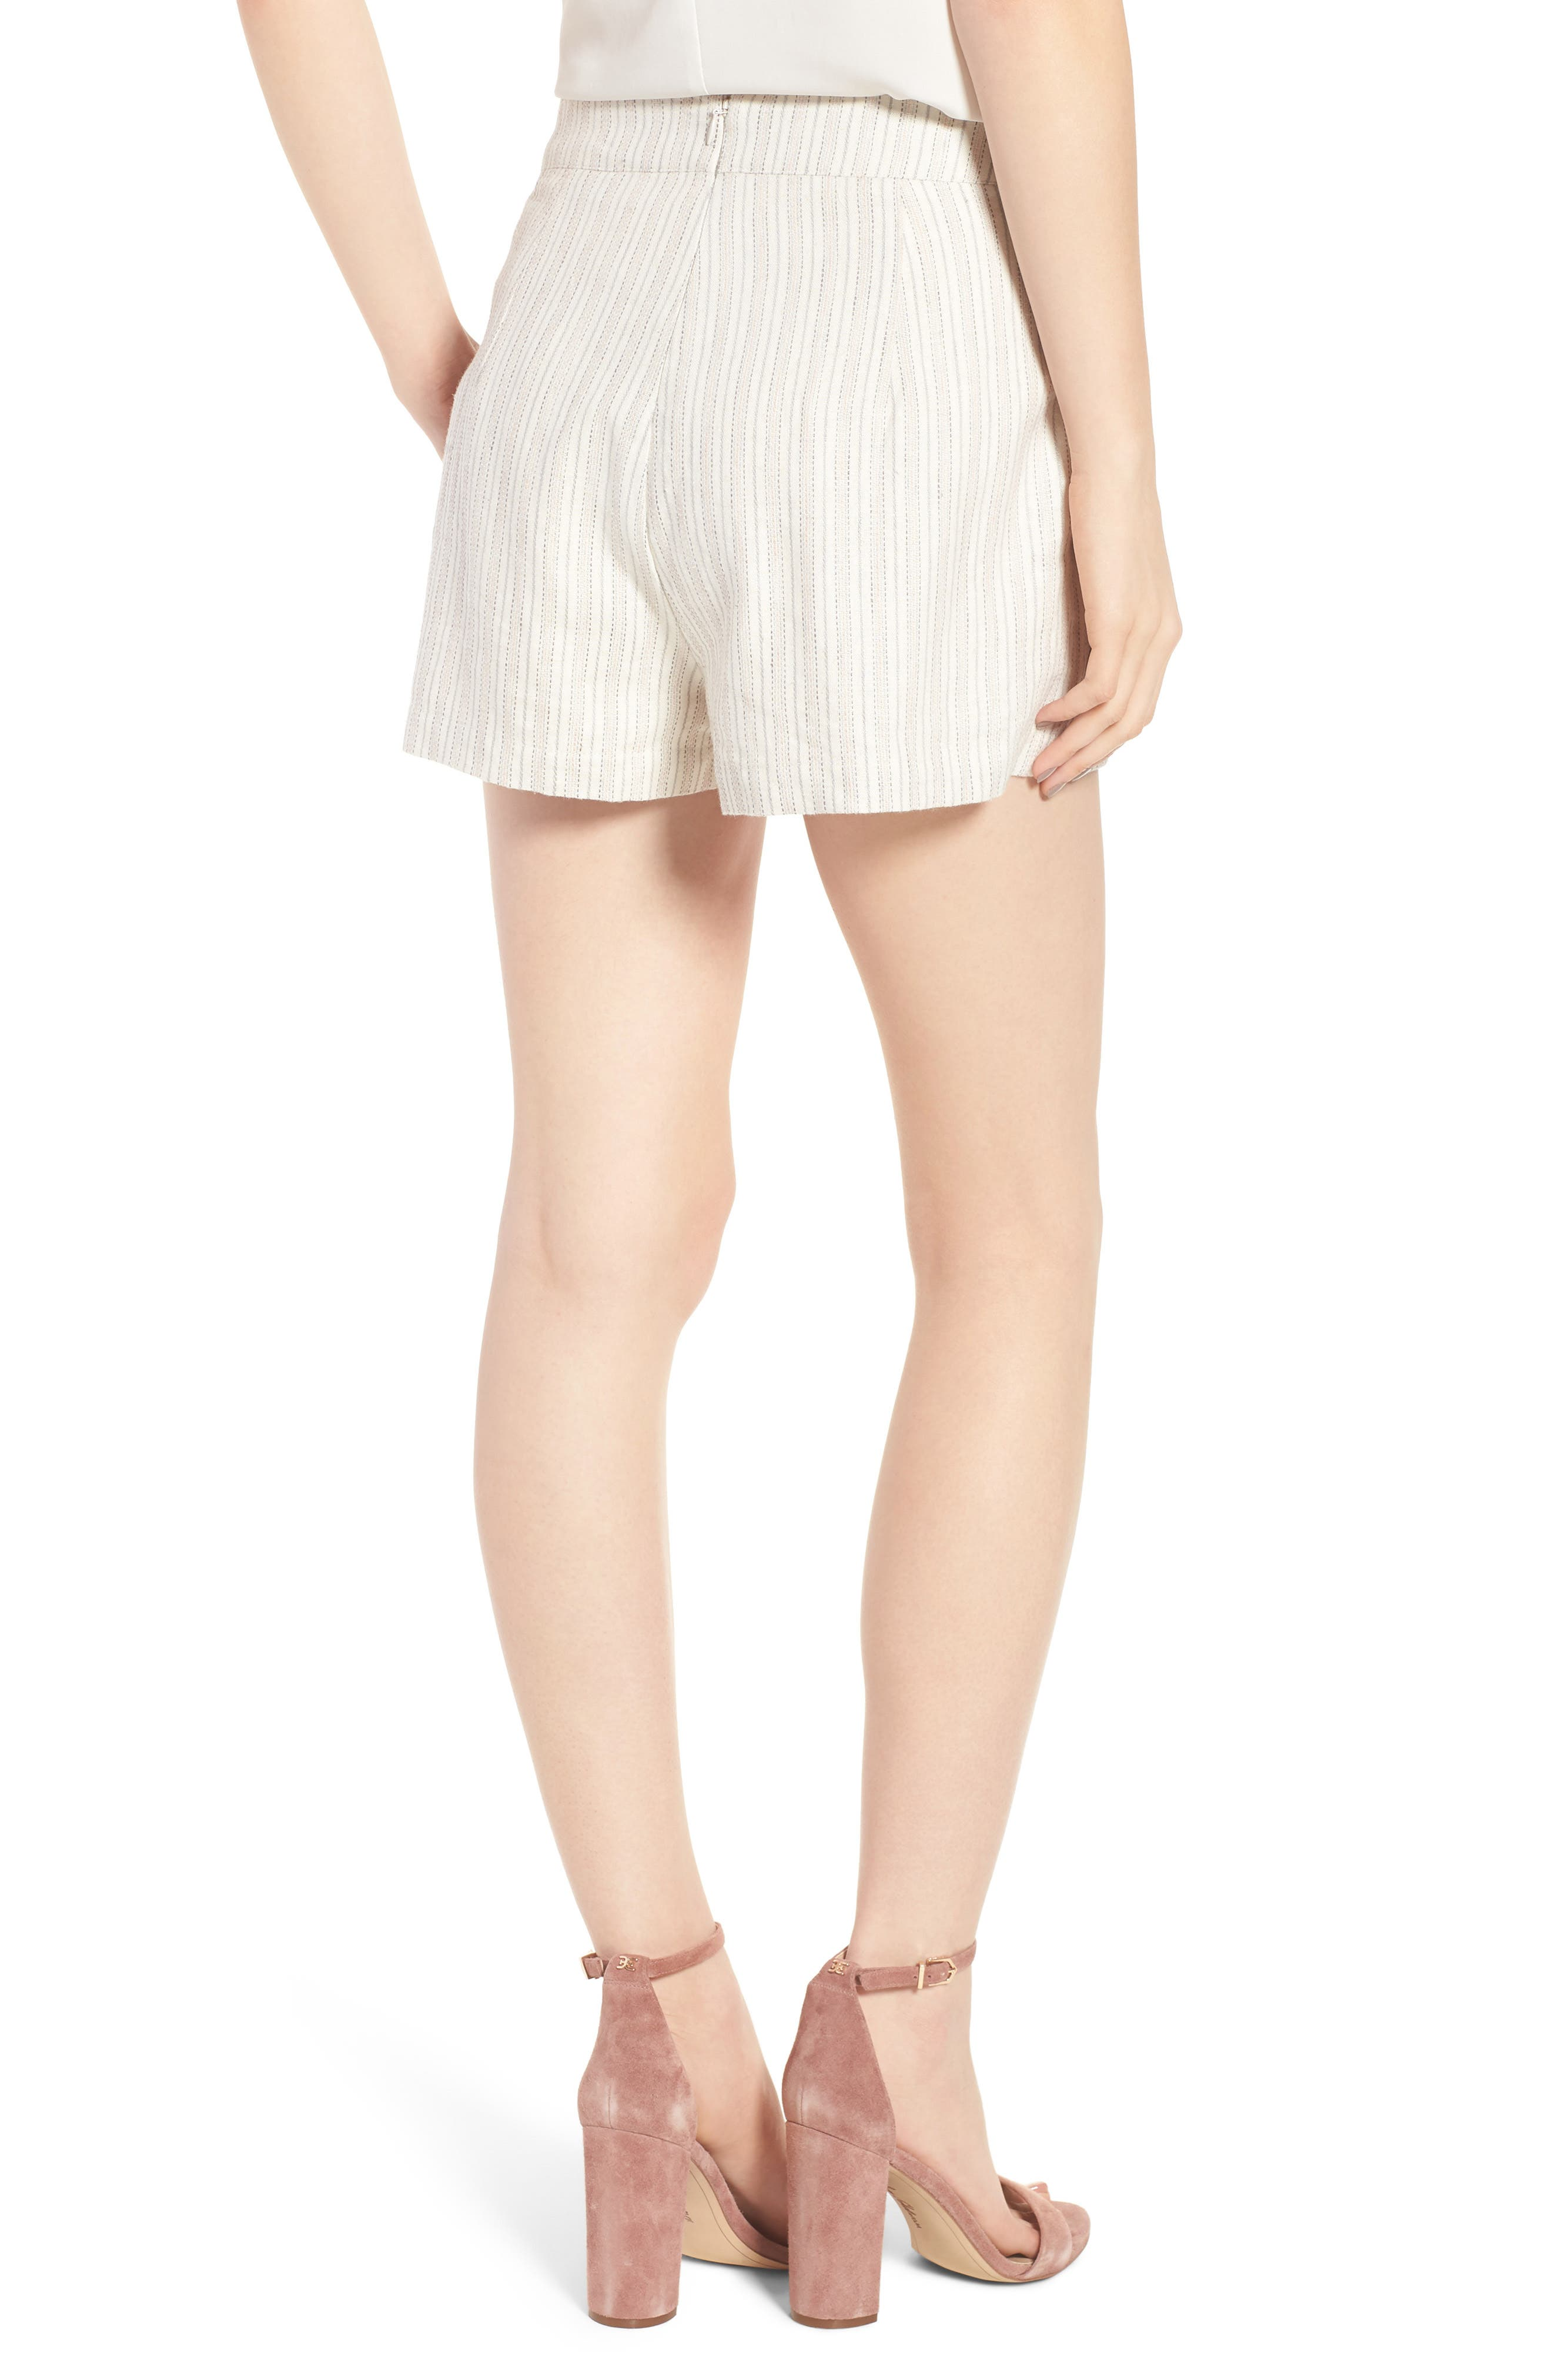 Alta Shorts,                             Alternate thumbnail 3, color,                             Ivory